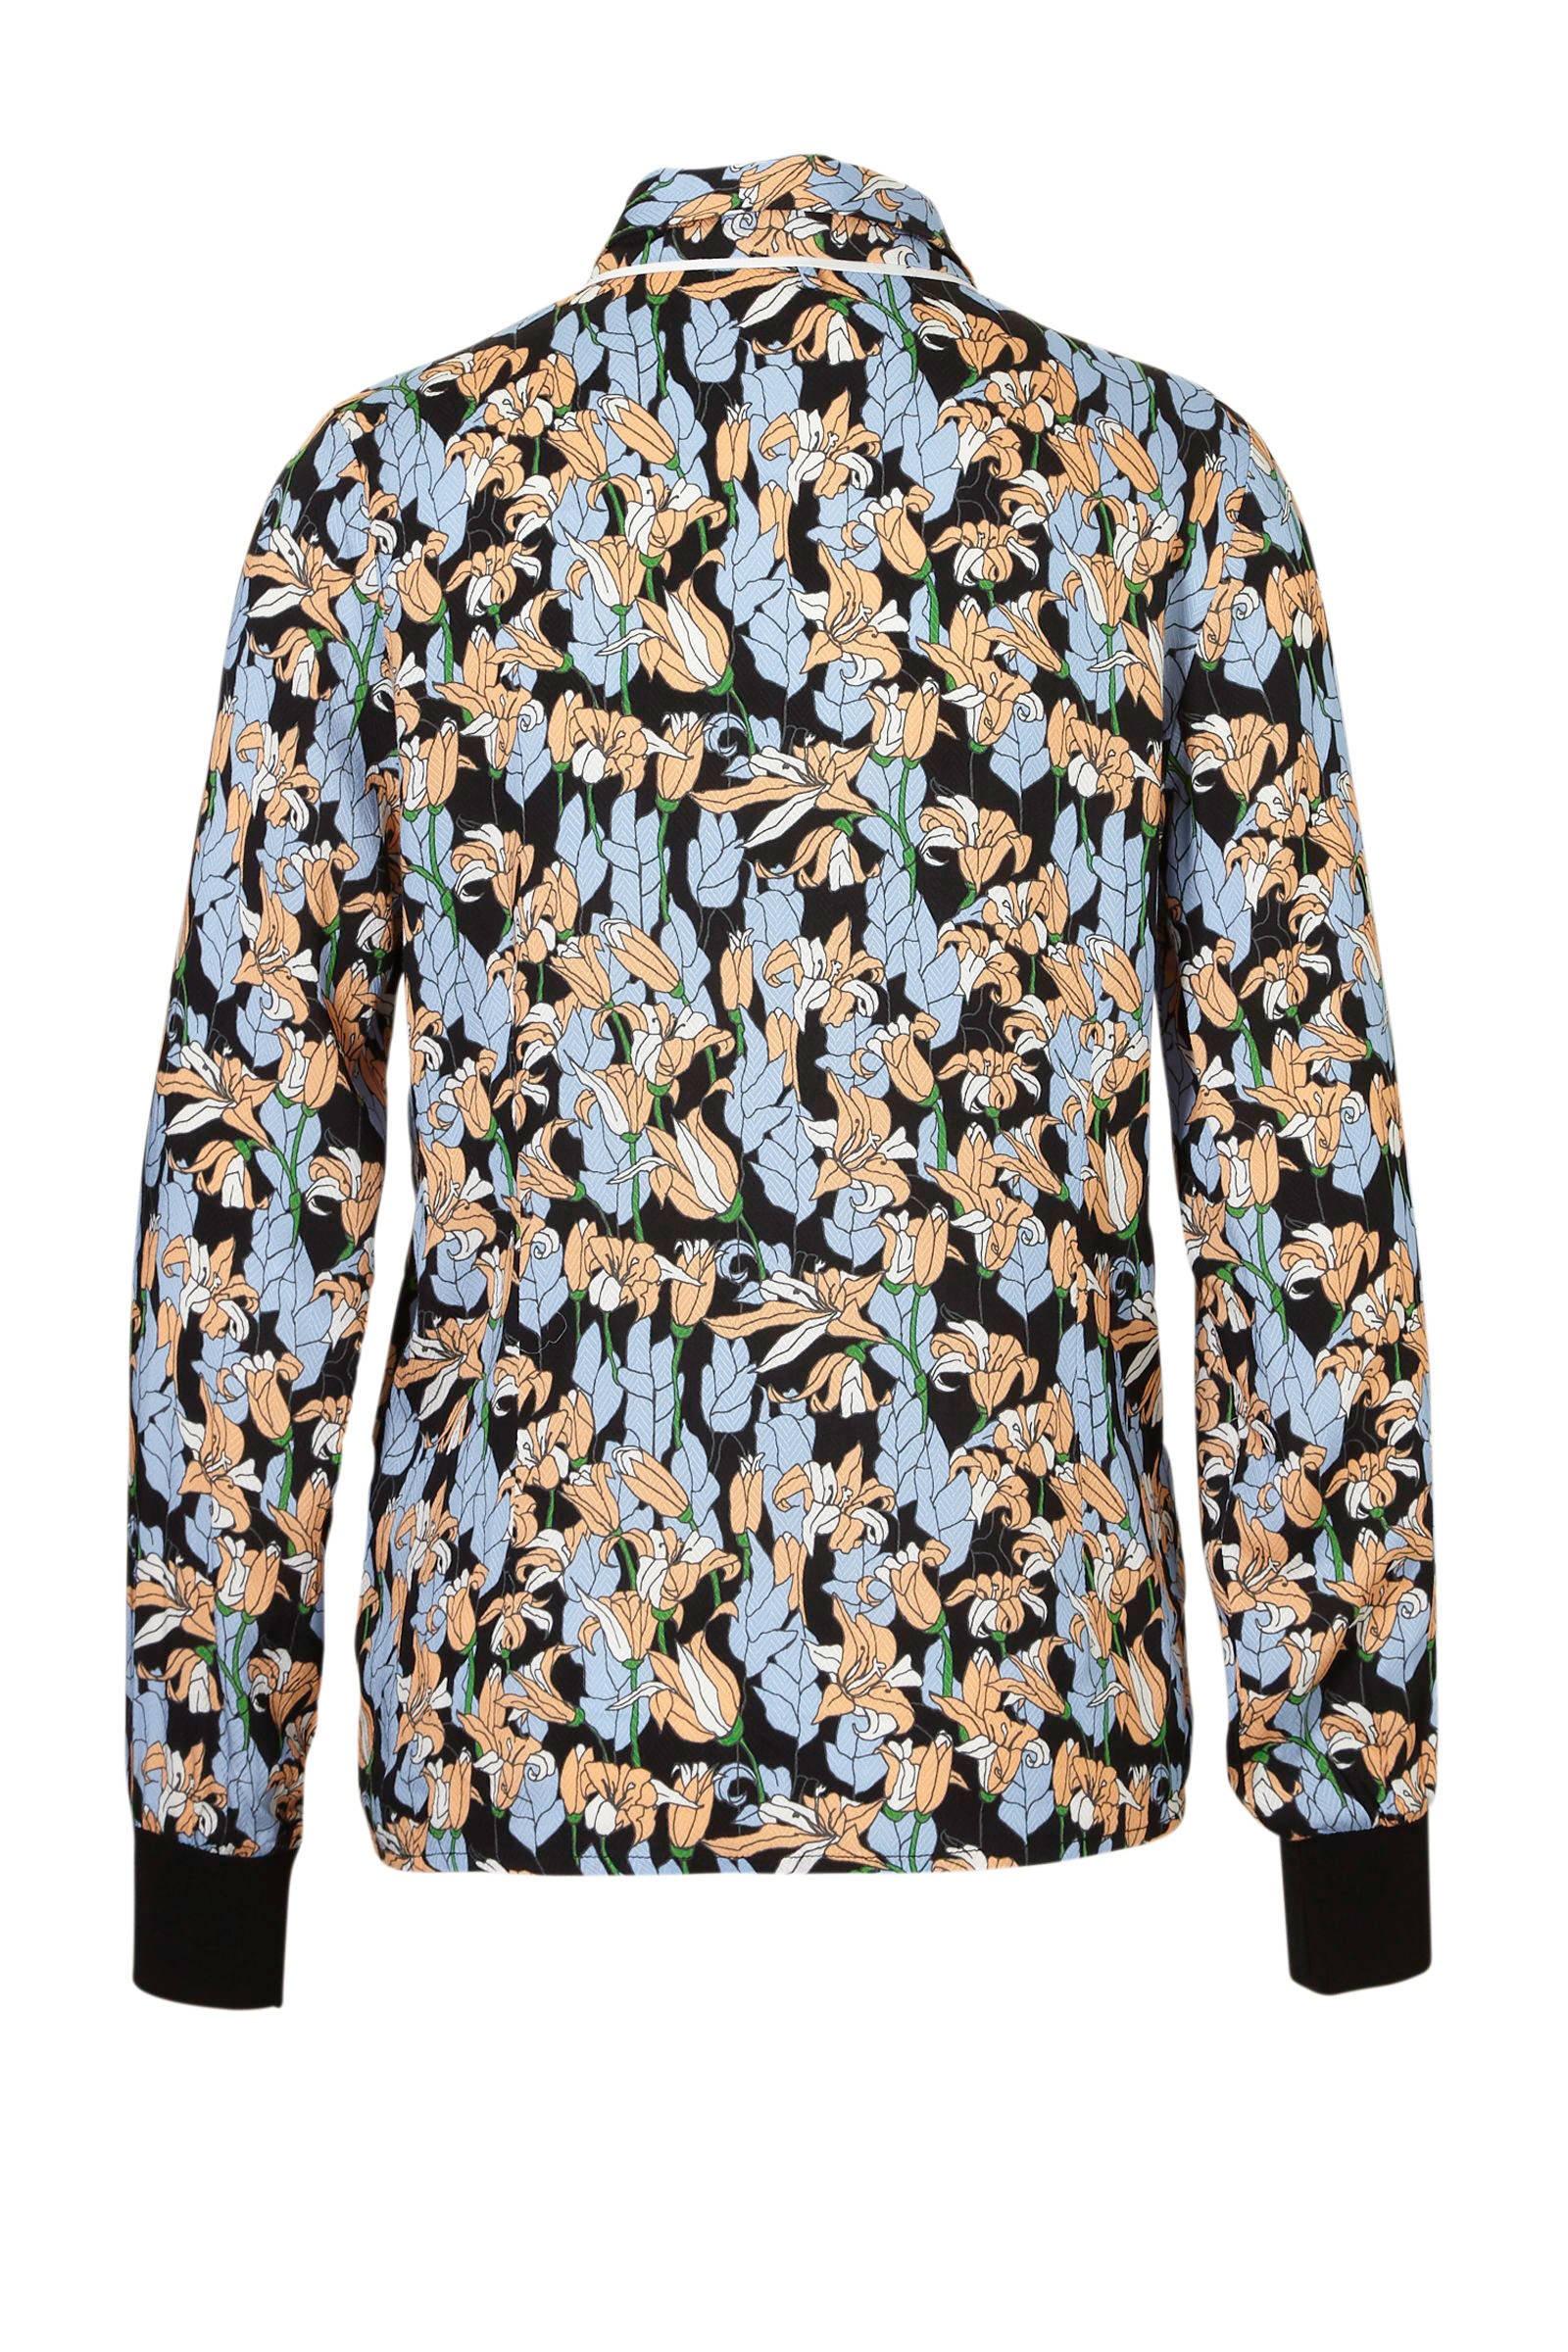 Aaiko blouse Aaiko blouse Aaiko blouse gebloemde gebloemde blouse blouse gebloemde Aaiko gebloemde Aaiko gebloemde Aaiko gebloemde blouse 8pgqn4